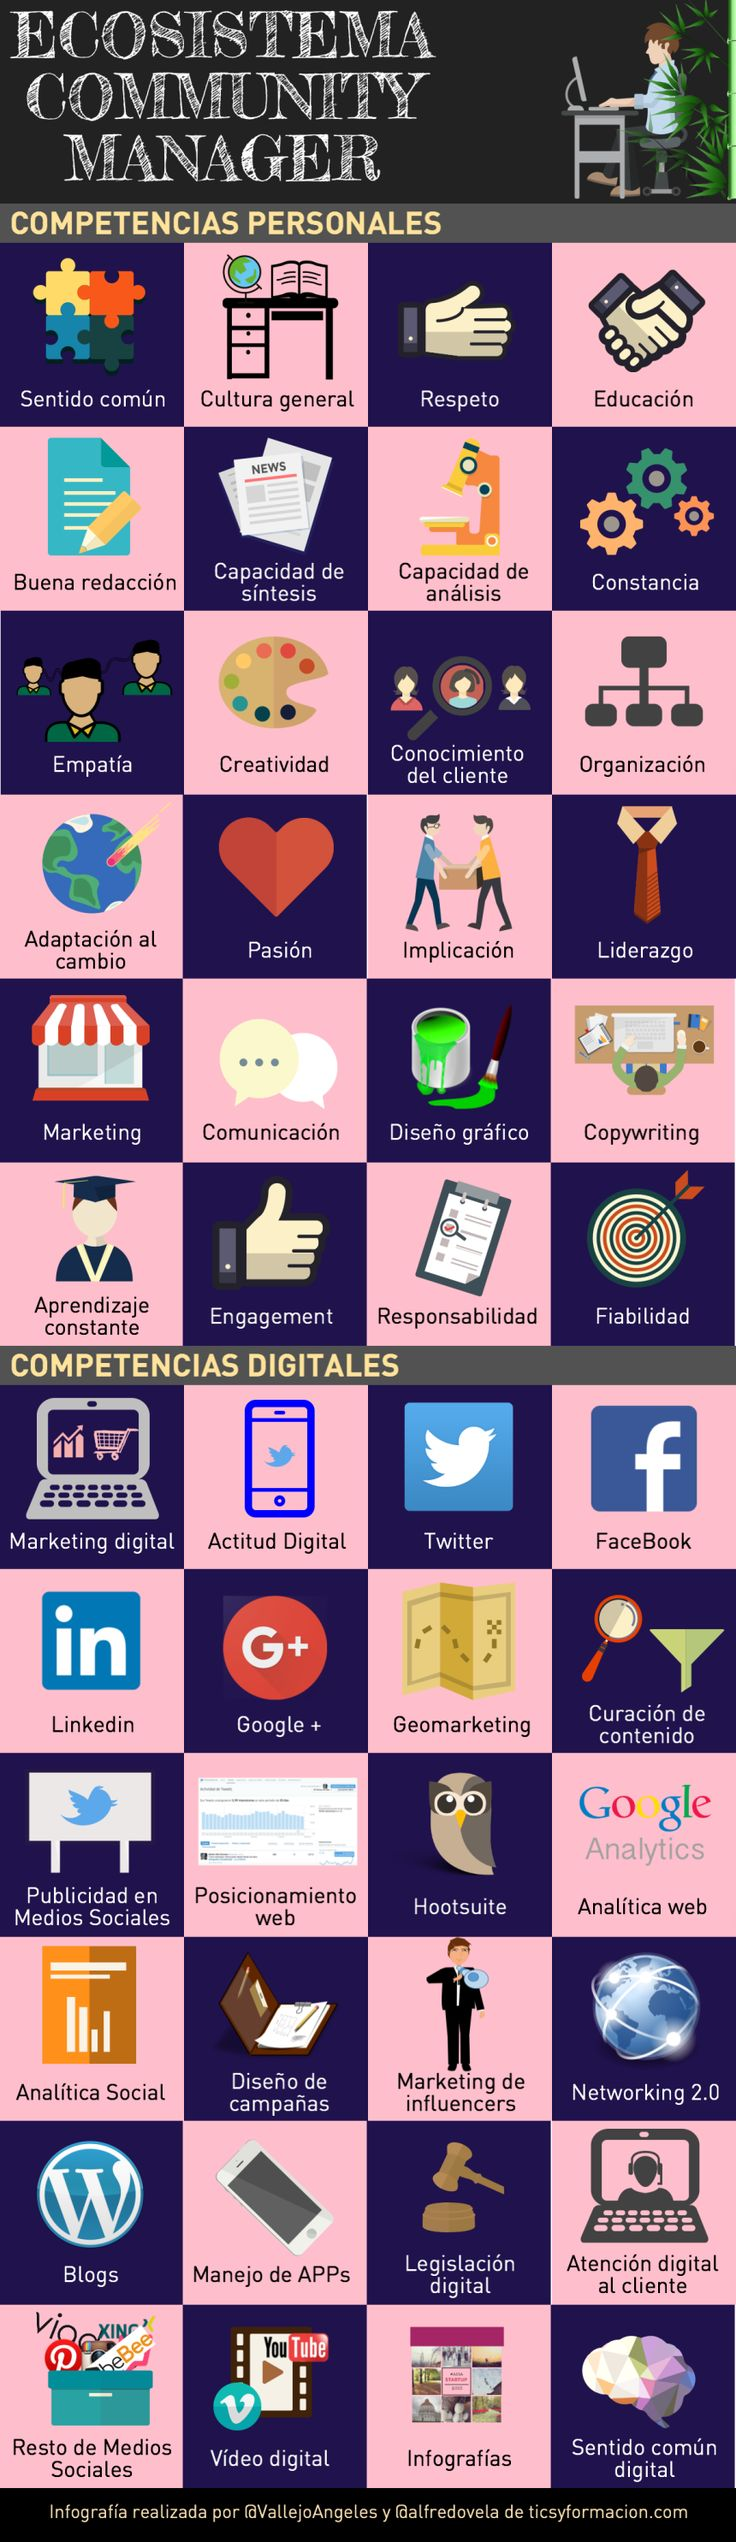 Ecosistema del Community Manager #infografia #infographic #socialmedia